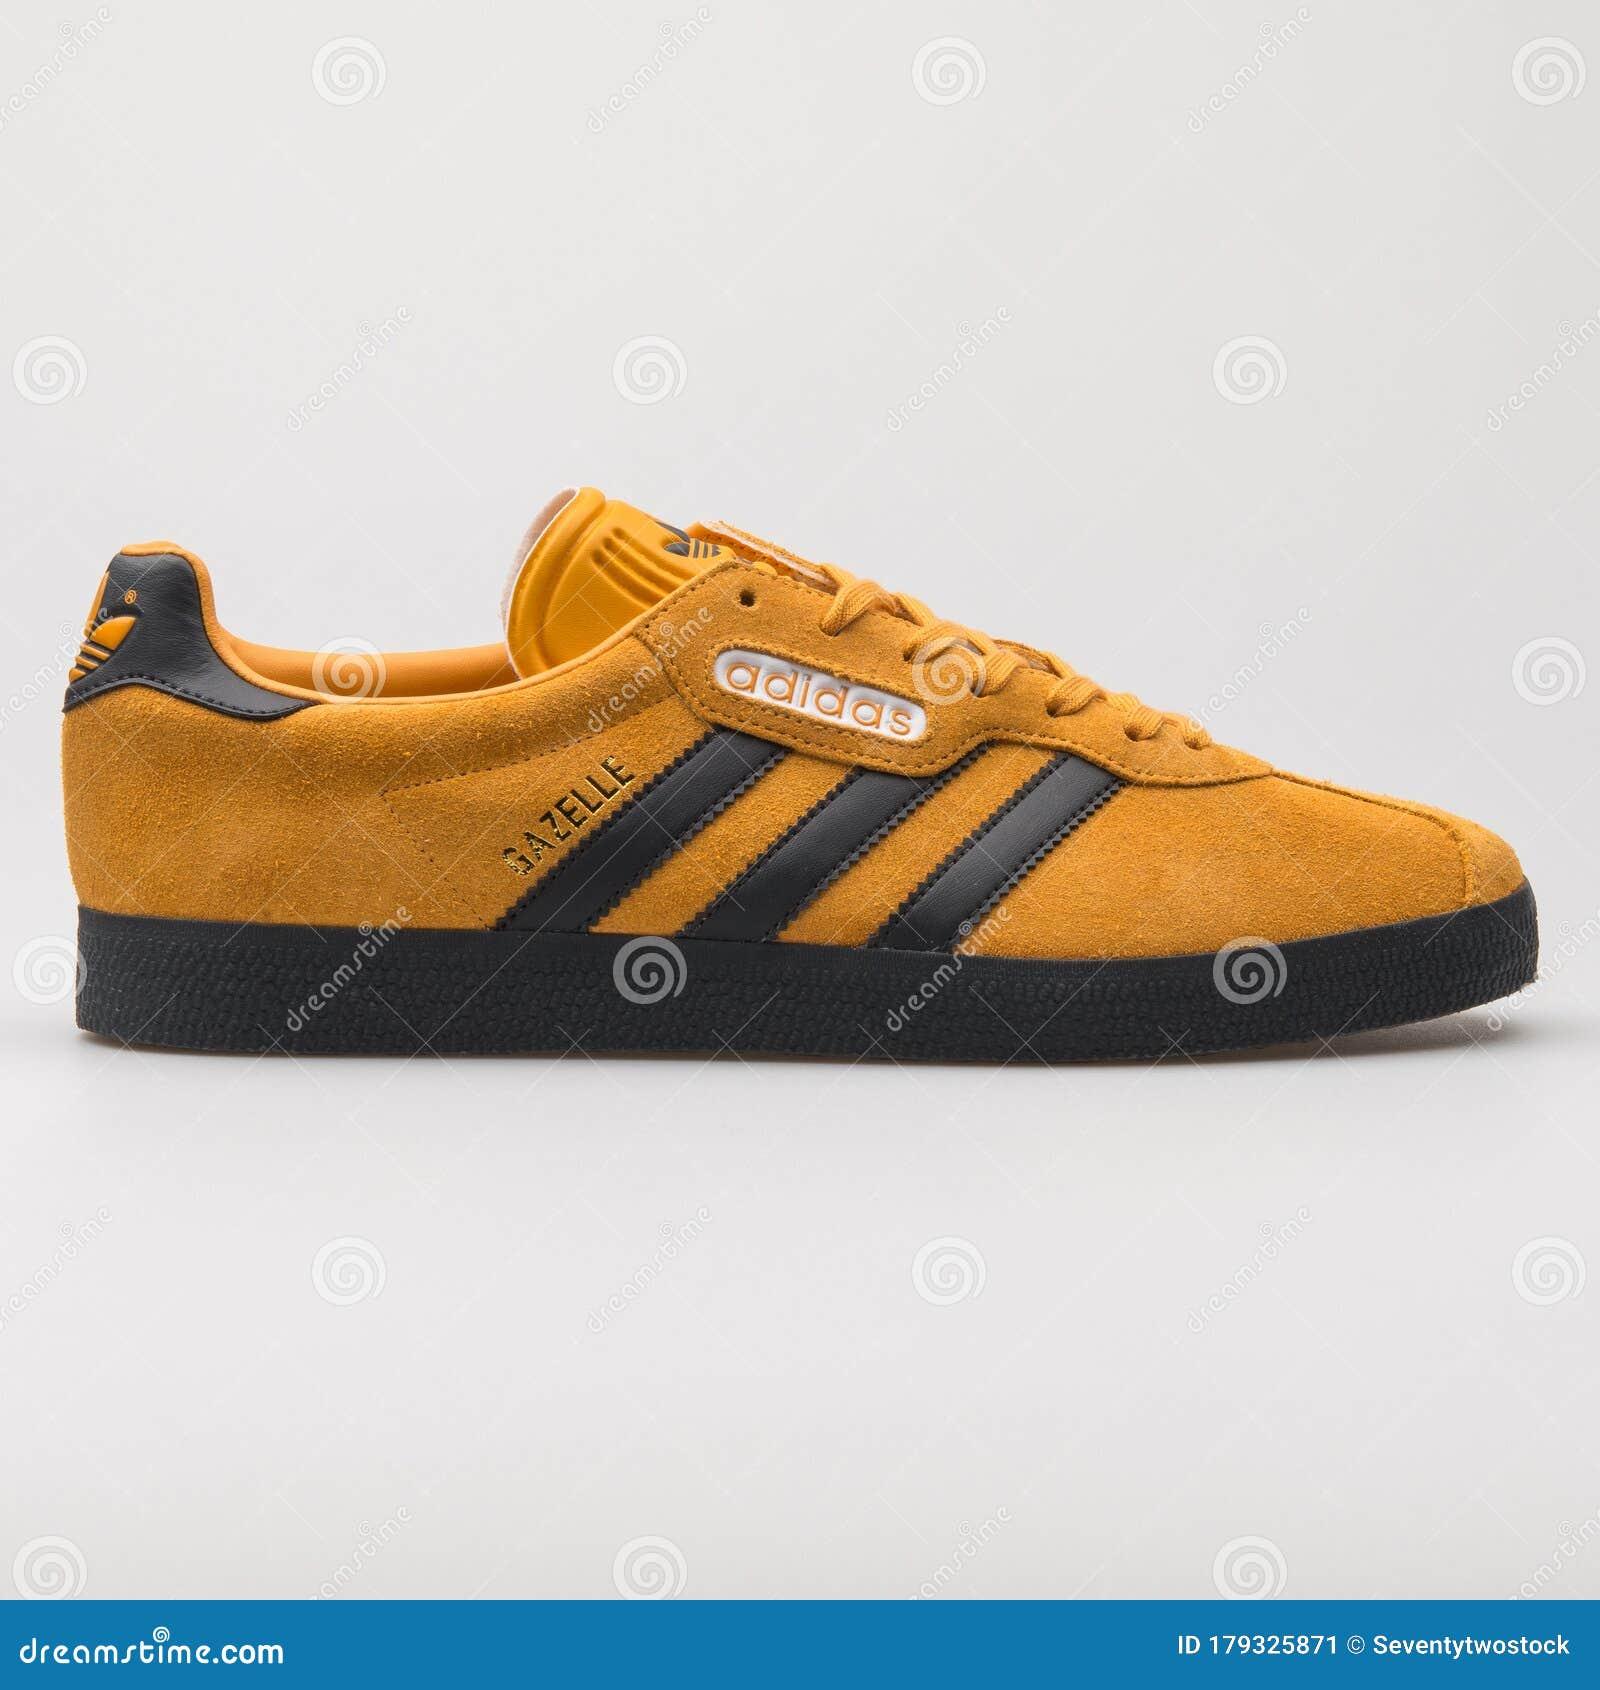 Adidas Gazelle Orange And Black Sneaker Editorial Photo - Image of ...